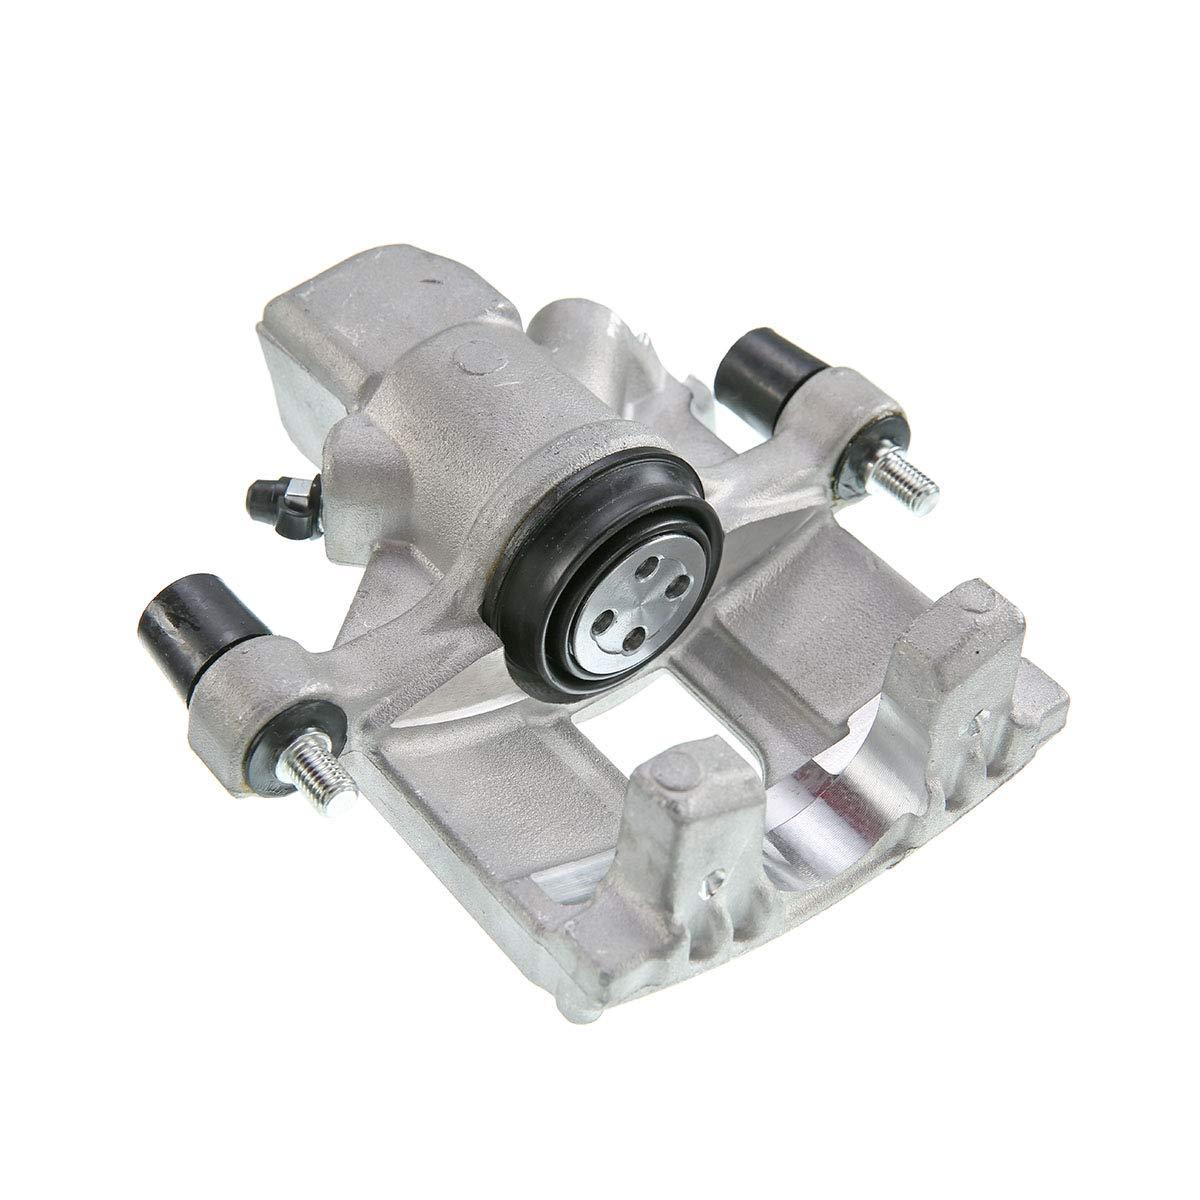 A-Premium Disc Brake Caliper for Mini Cooper R50 R52 R53 2003-2008 Rear Right Passenger Side